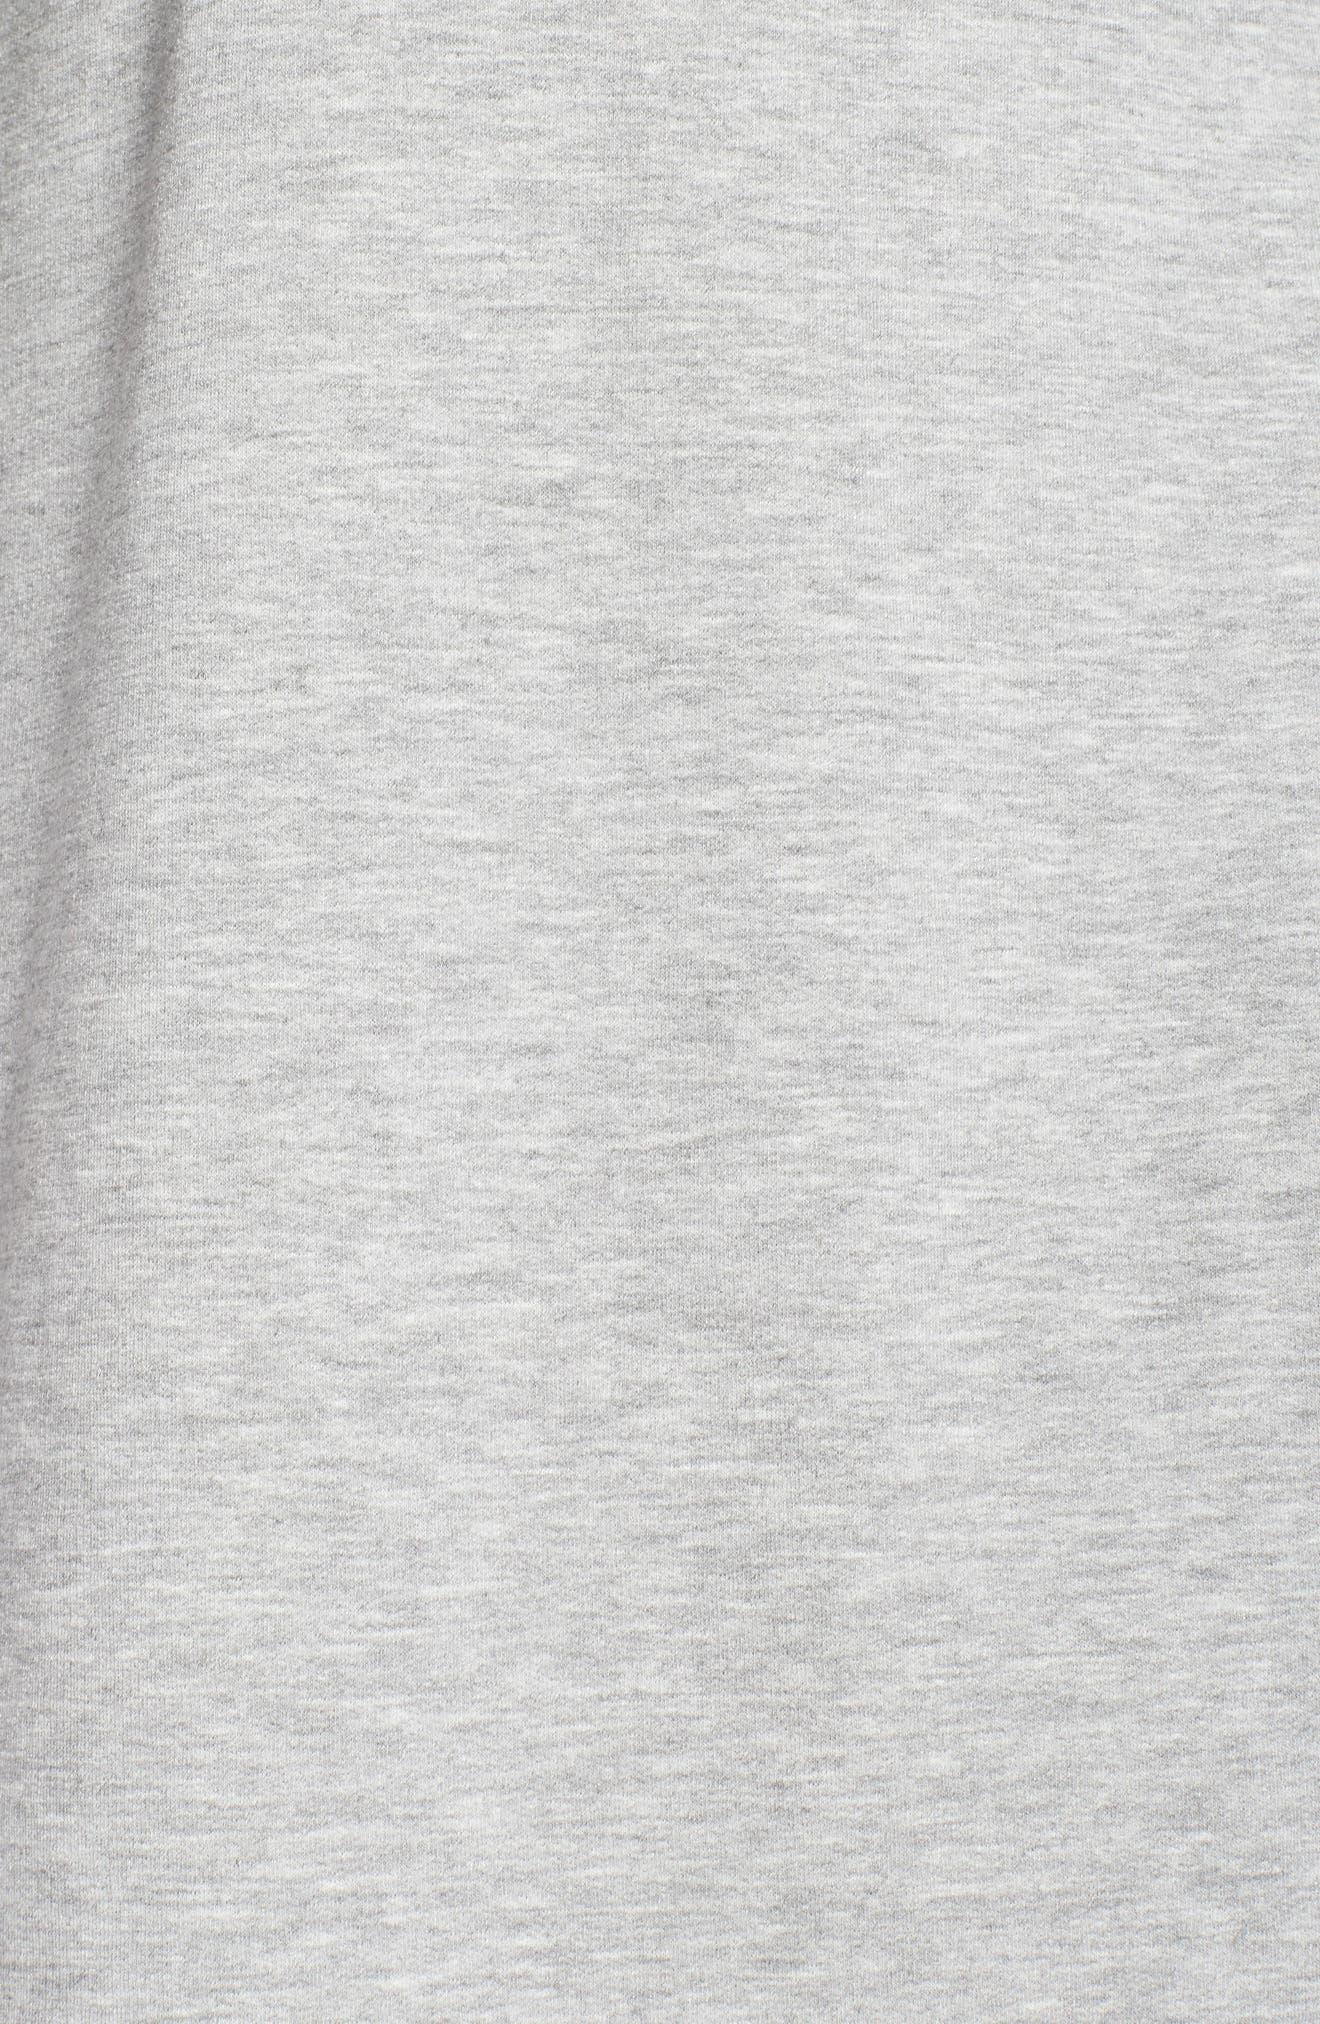 Off-Duty Fleece Knit Cardigan,                             Alternate thumbnail 6, color,                             Grey Heather